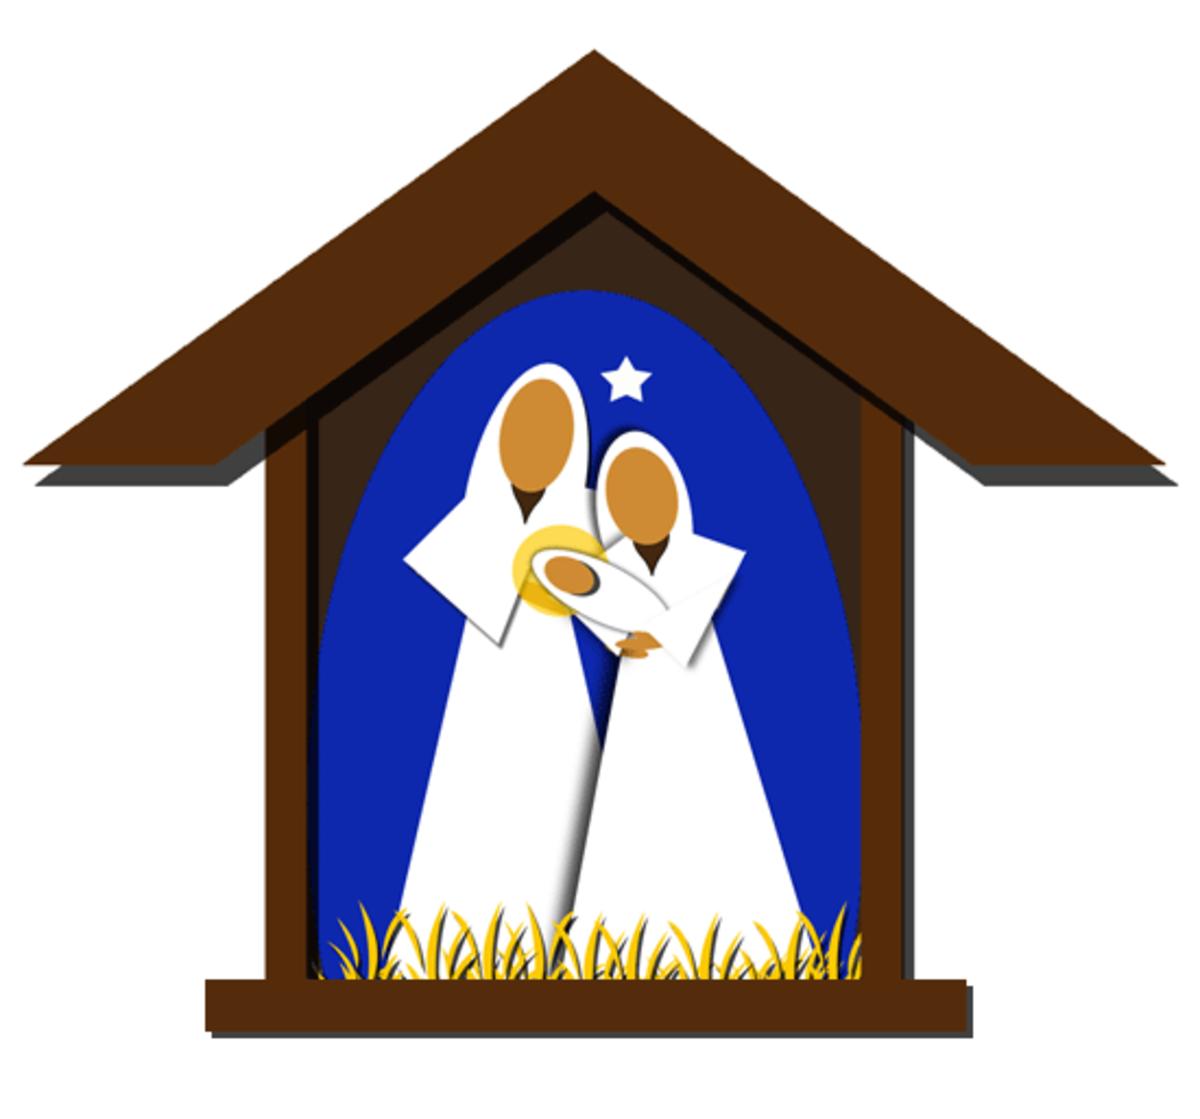 Christmas Nativity Scene Clipart Image